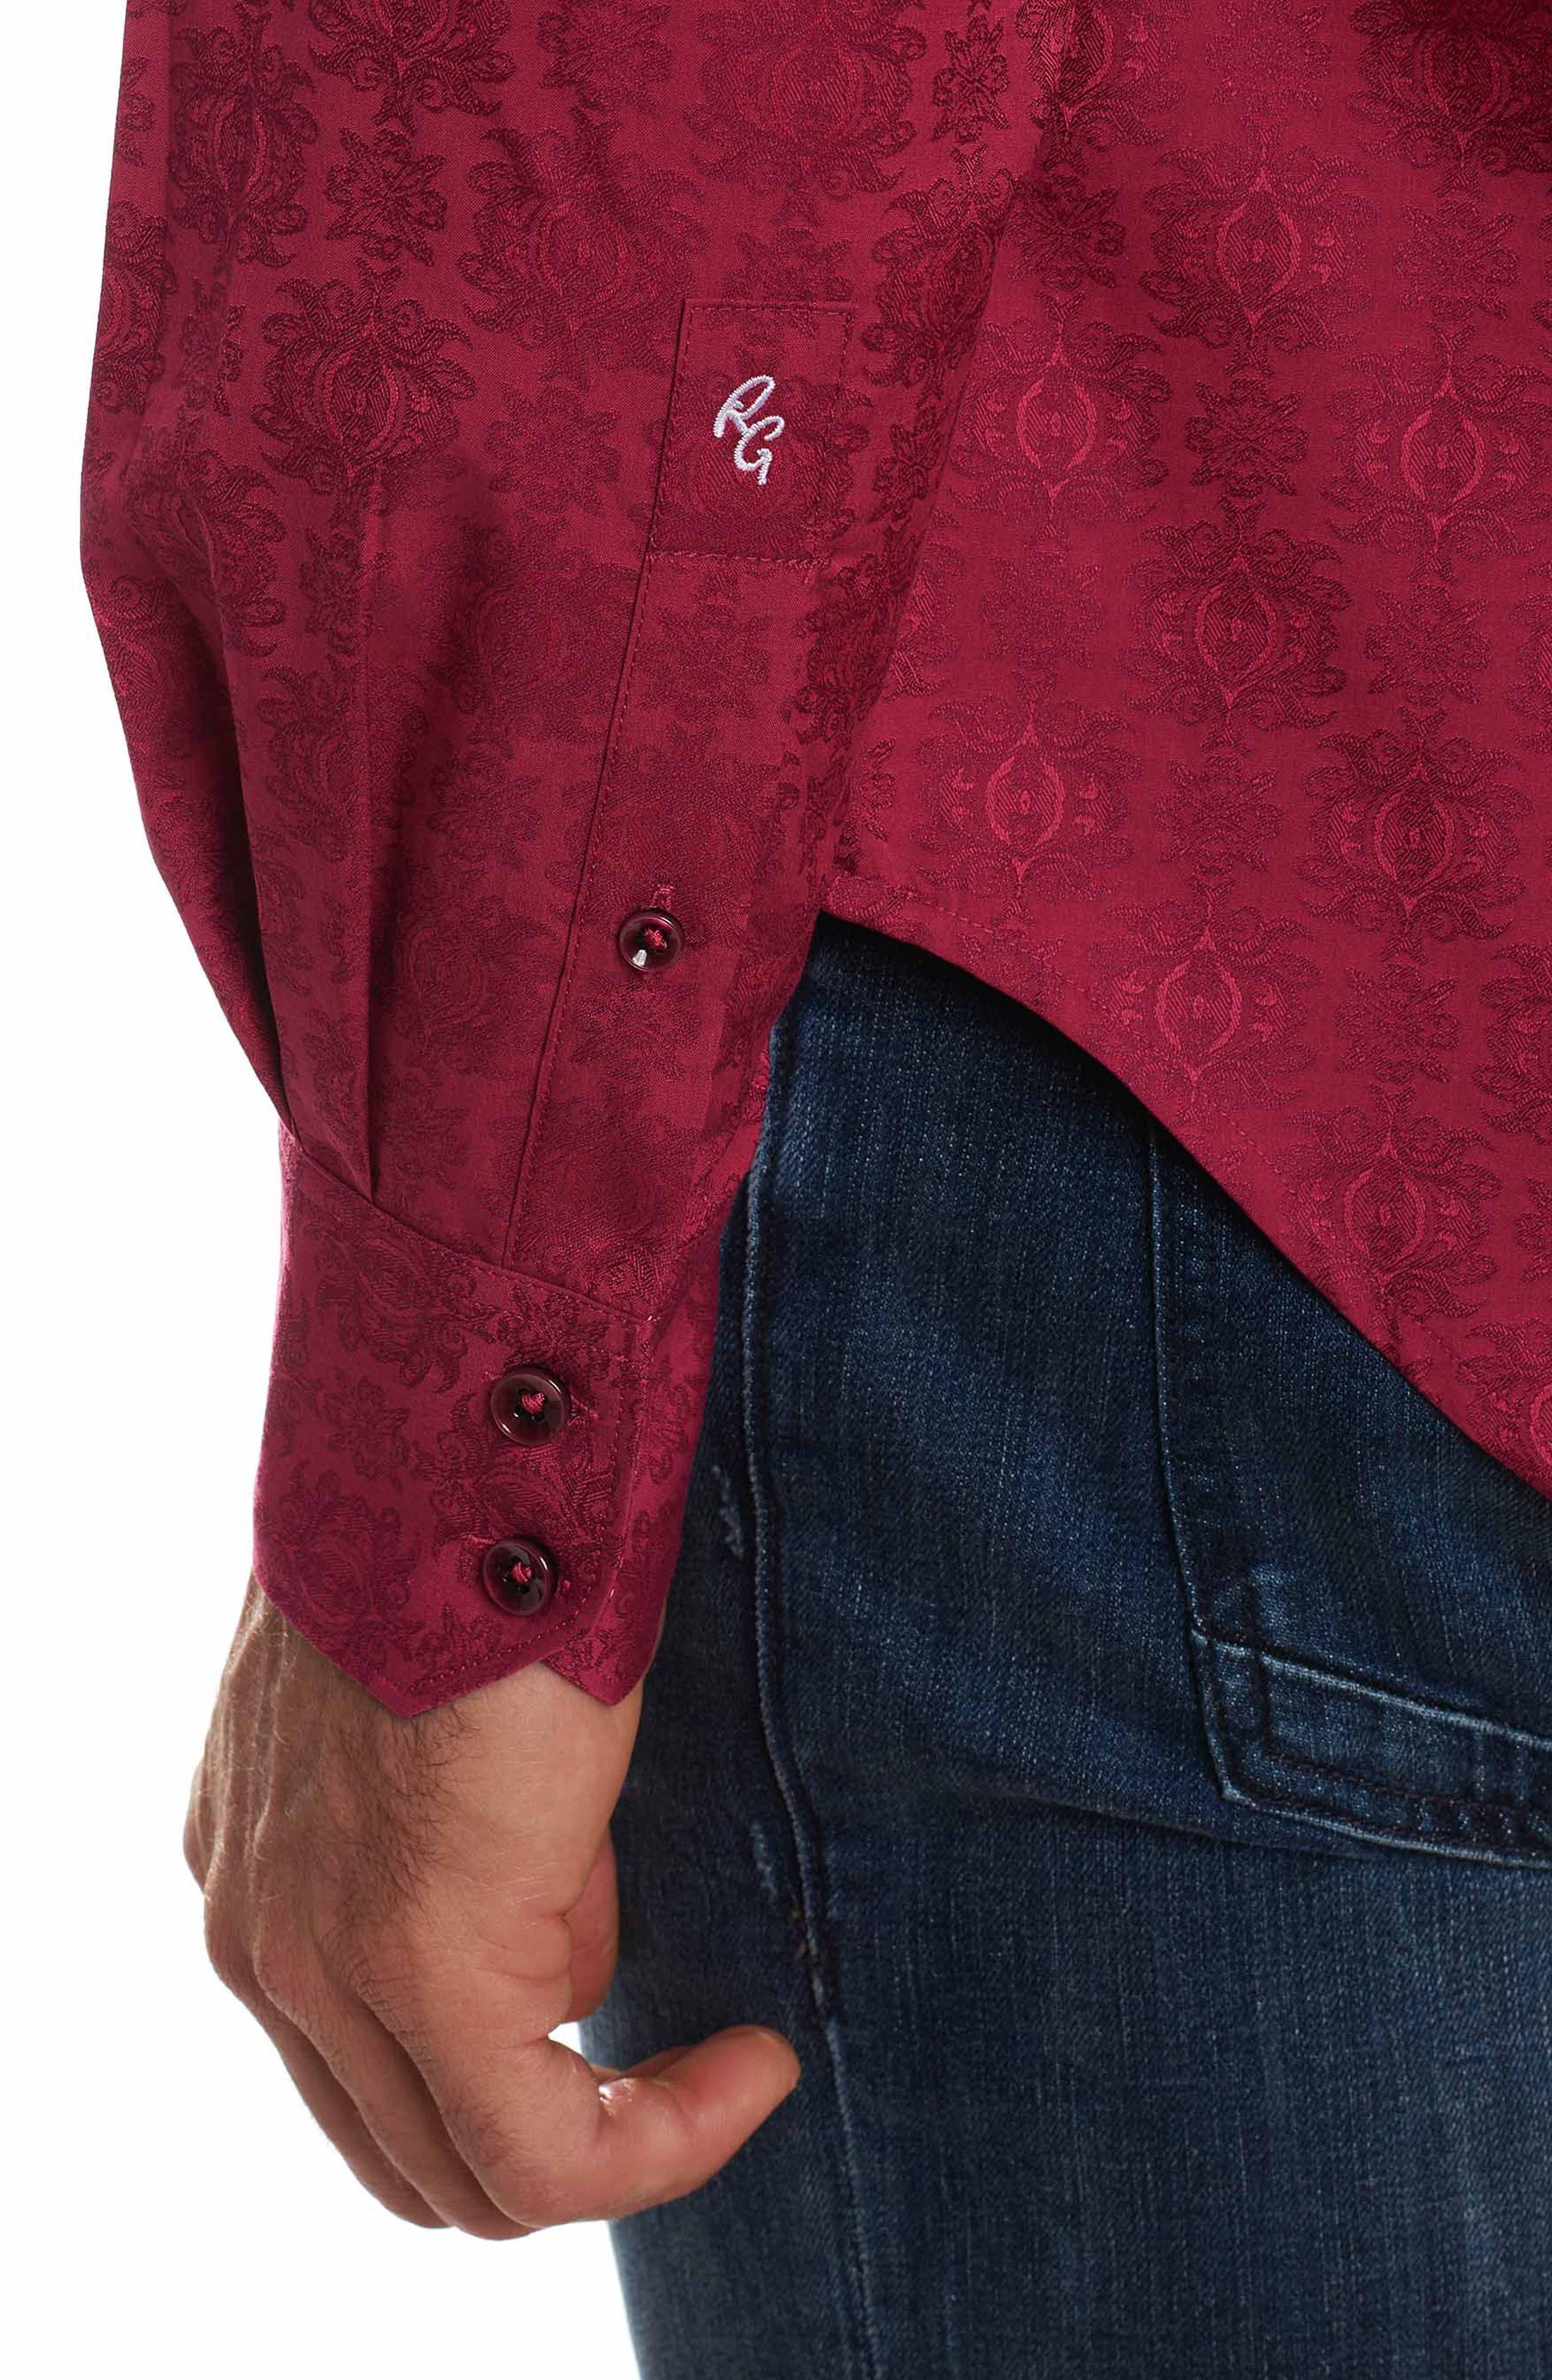 Cullen Classic Fit Jacquard Sport Shirt,                             Alternate thumbnail 6, color,                             Rose